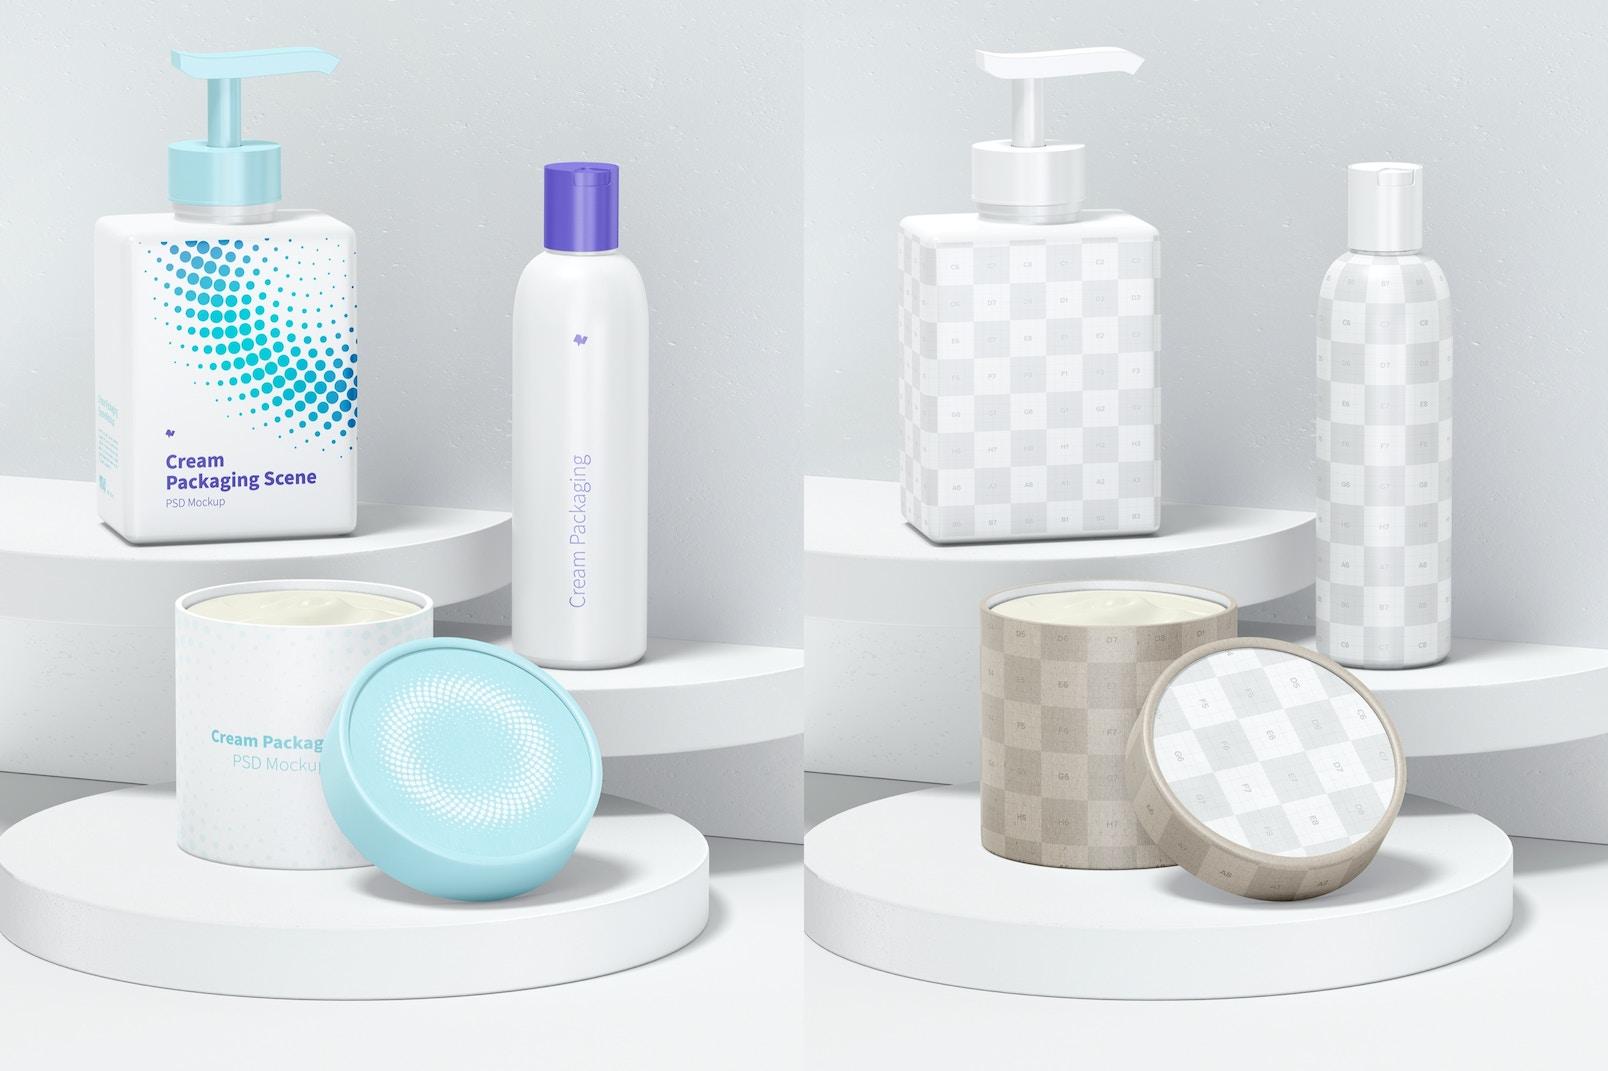 Cream Packaging Scene Mockup